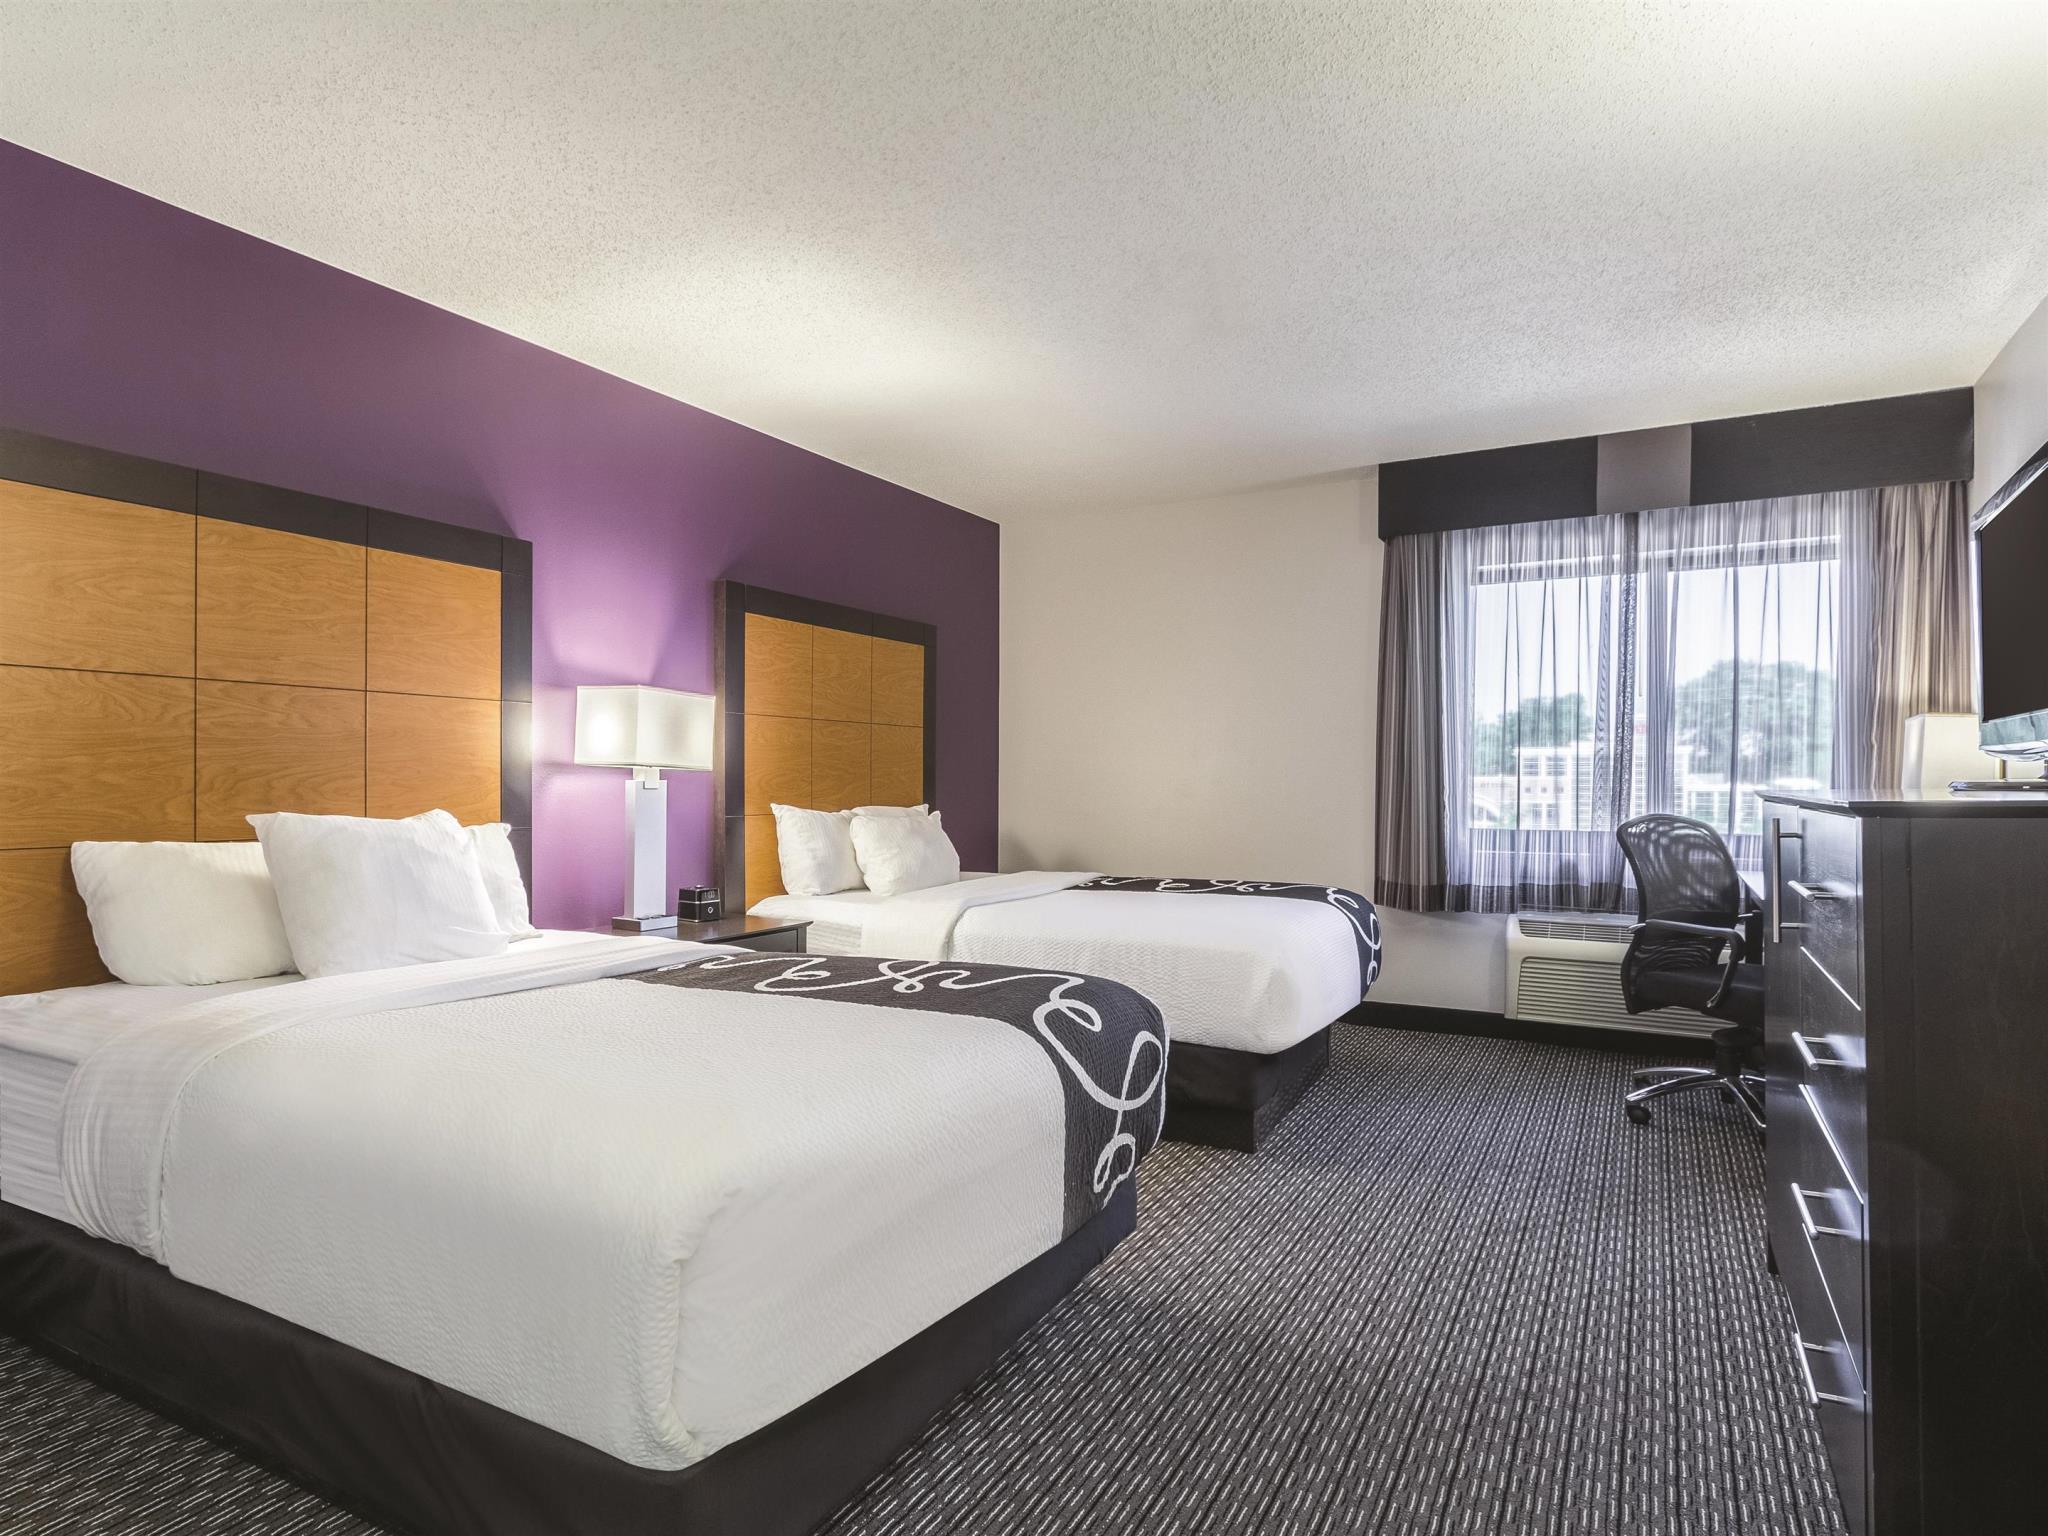 La Quinta Inn & Suites By Wyndham Seattle Bellevue Kirkland